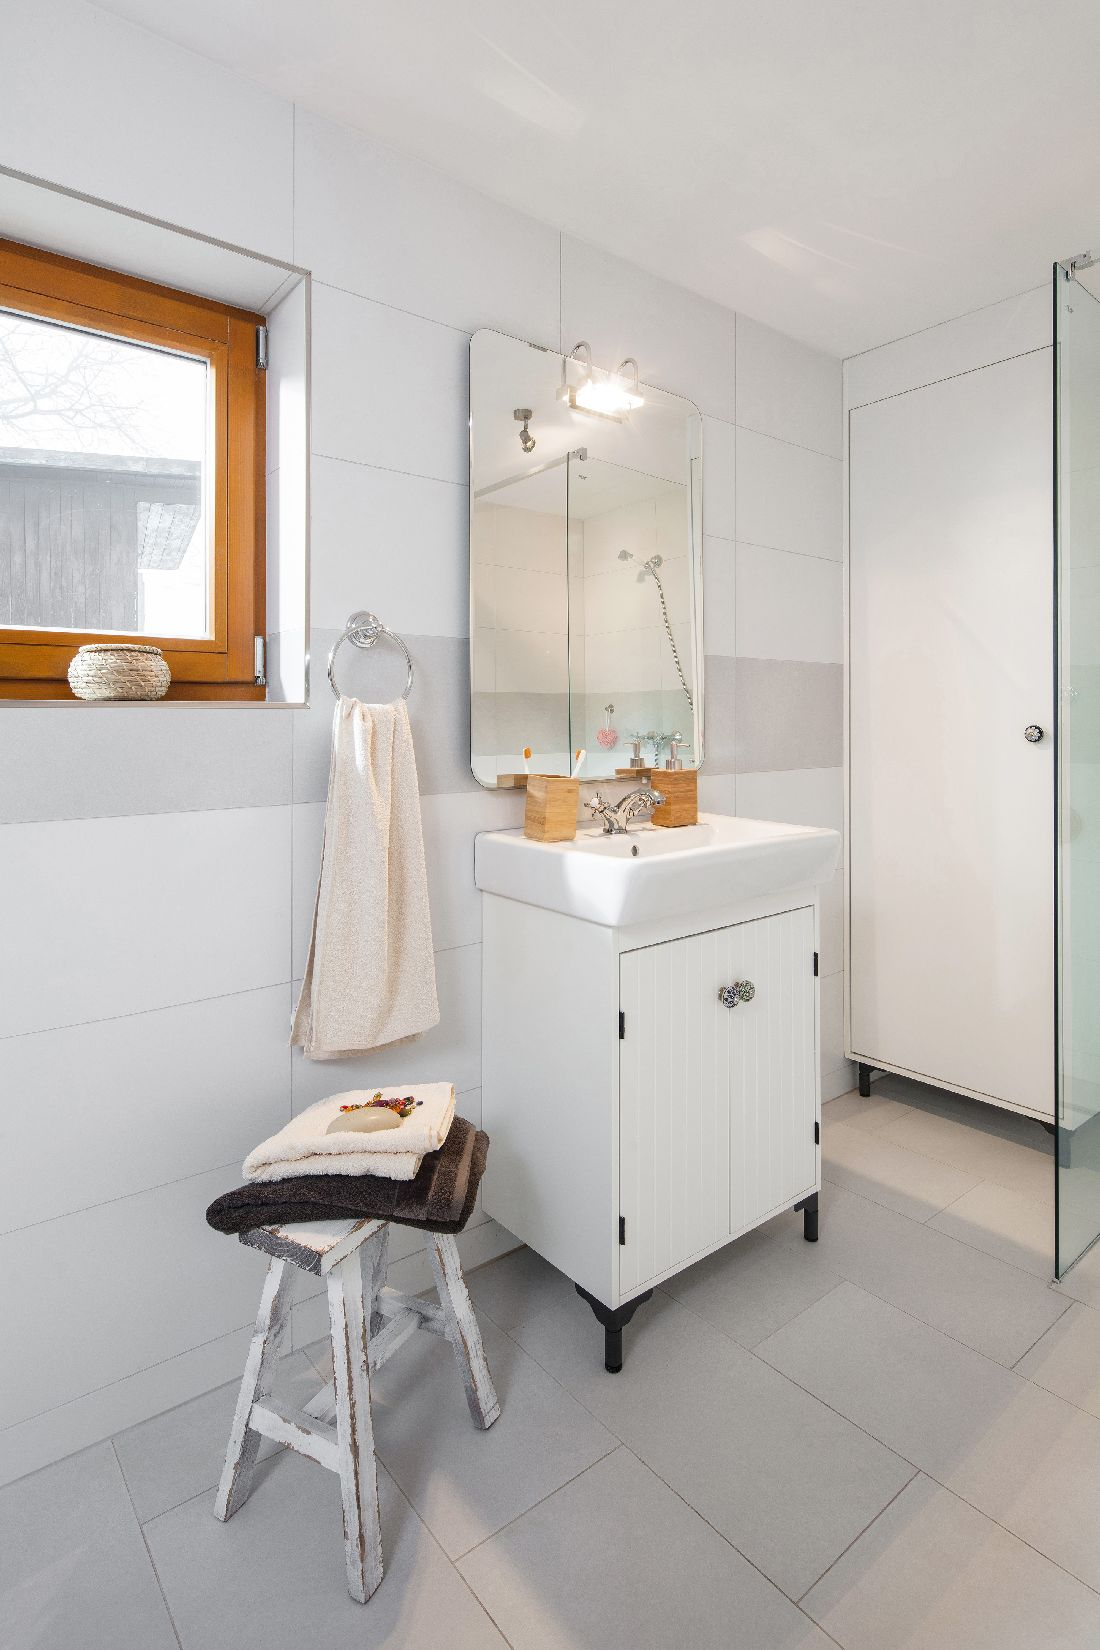 5-koupelna-francova-lhota-03.jpg